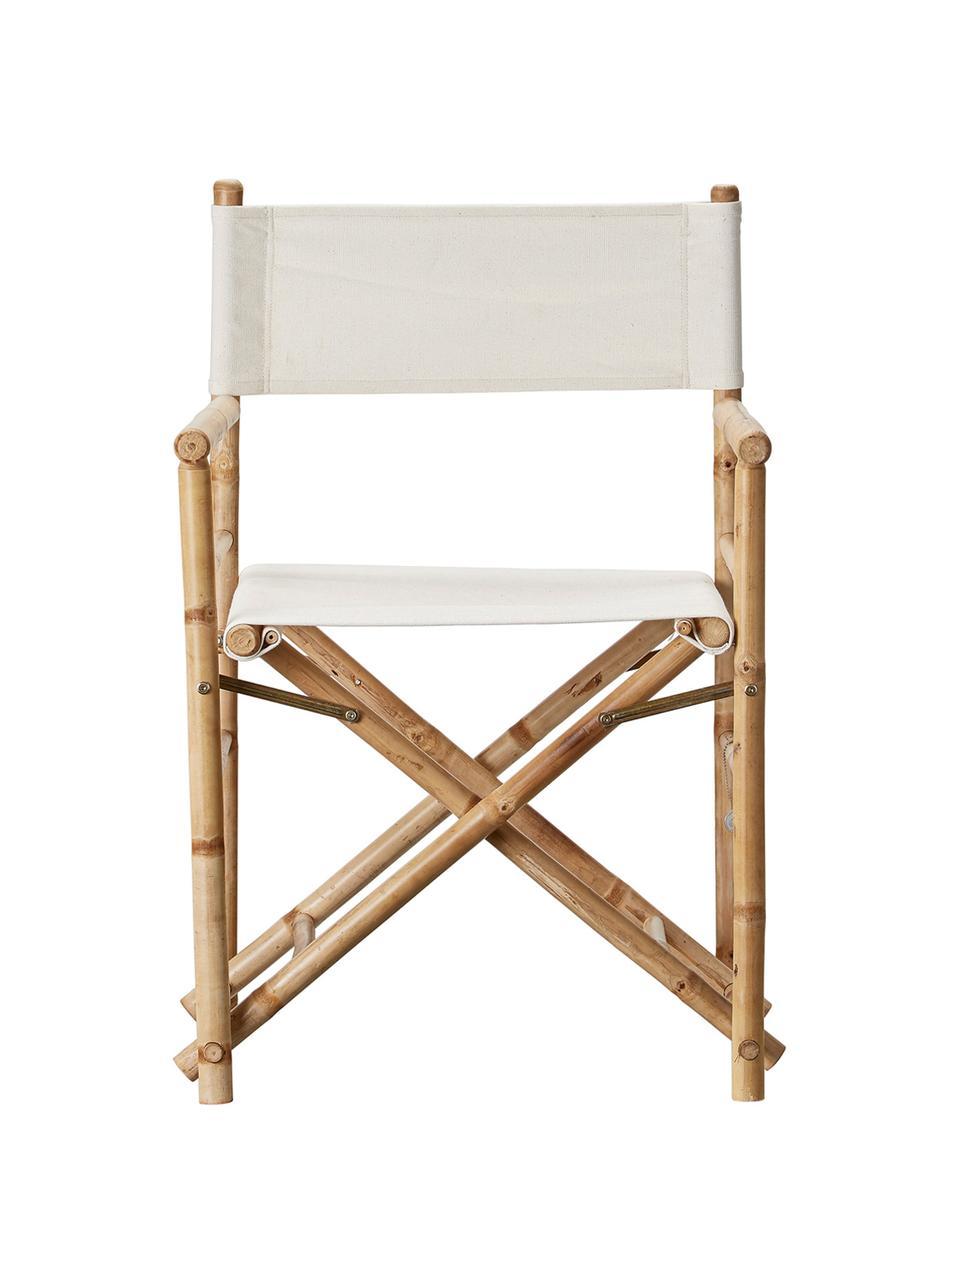 Opvouwbare regisseursstoel Mandisa van bamboehout, Frame: onbehandeld bamboehout, Frame: bamboehoutkleurig. Bespanning: helder linnenkleurig, 58 x 88 cm